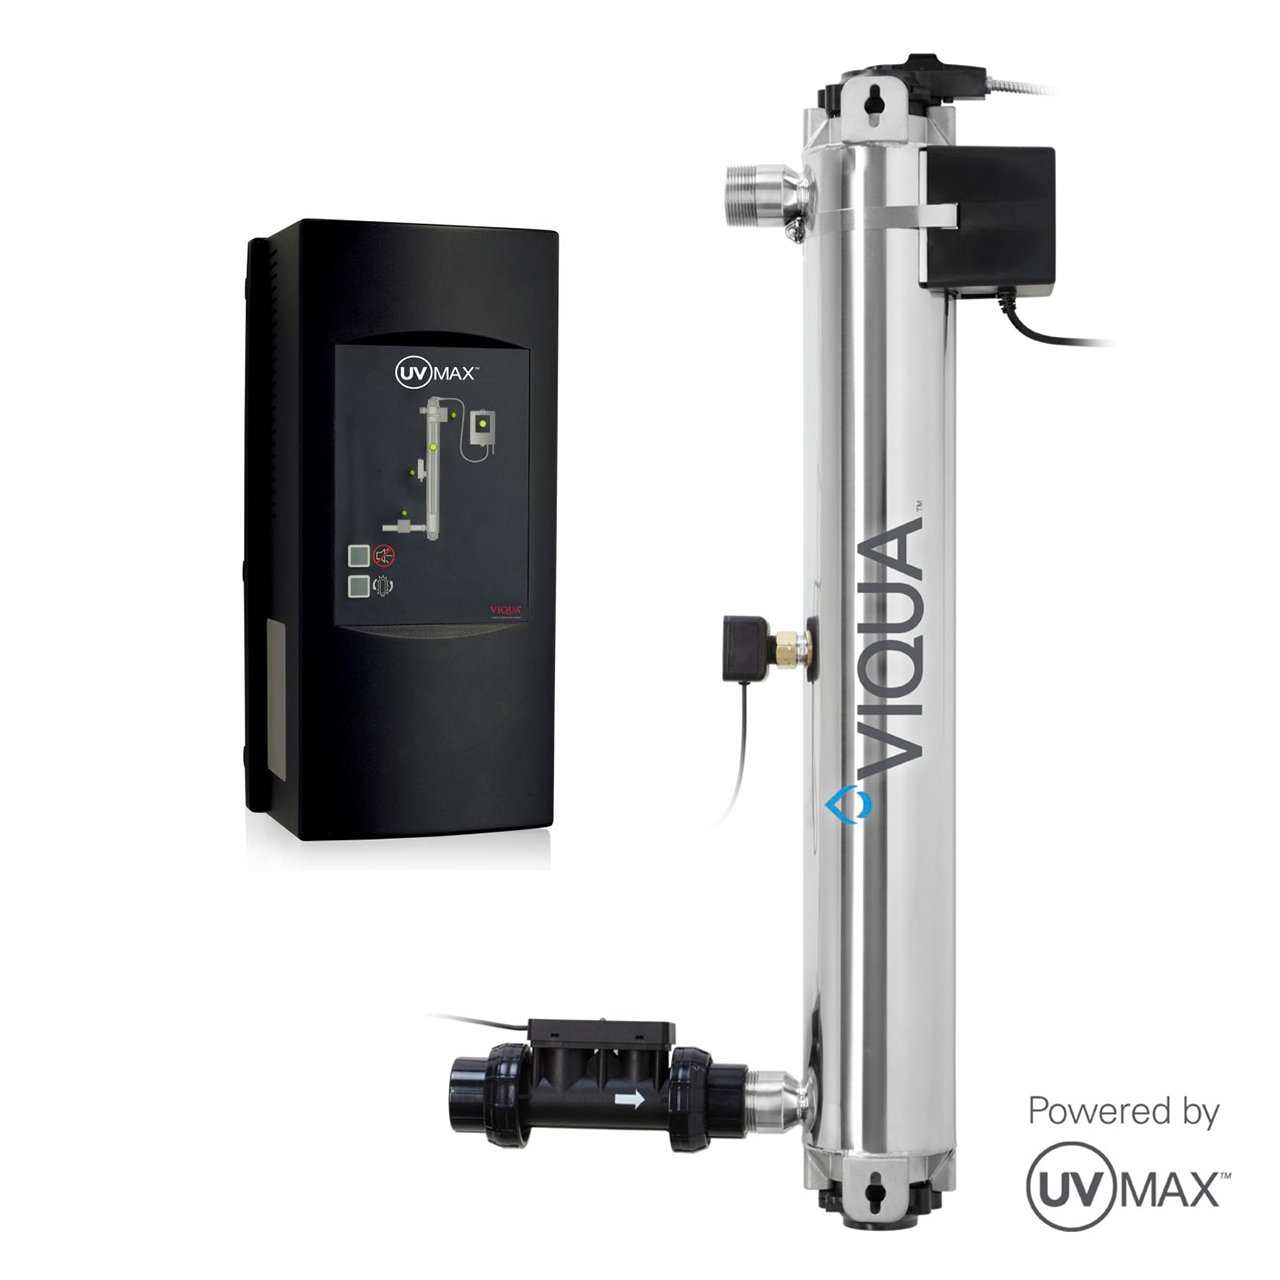 Viqua 650653 Pro20 UltraViolet Disinfection System